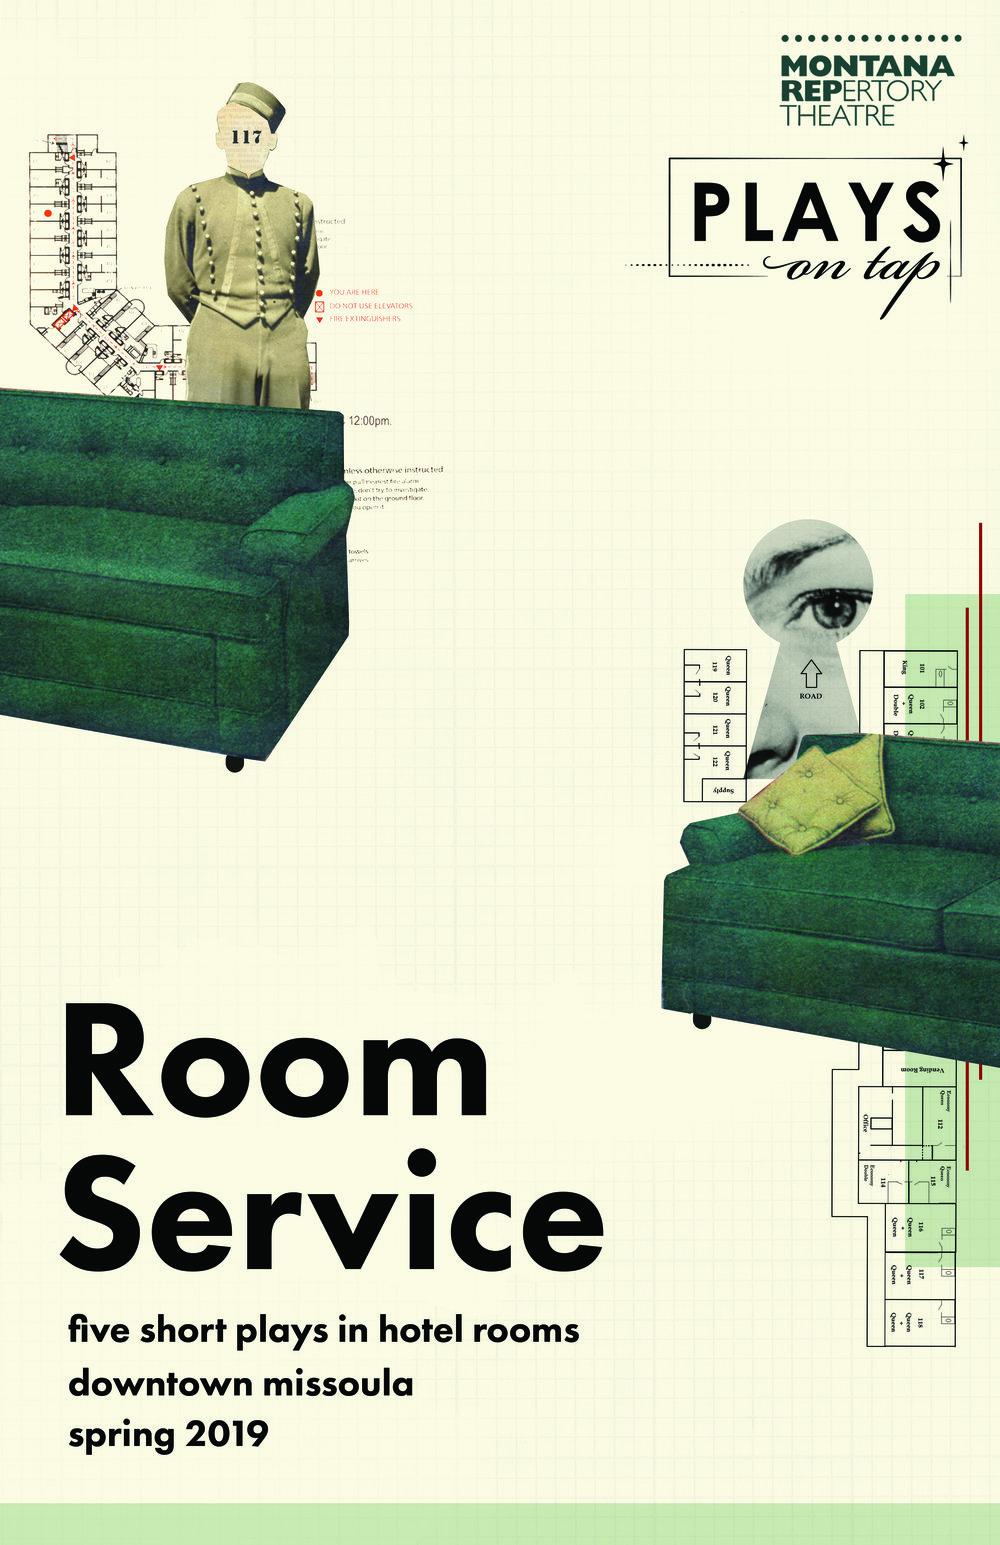 RoomServiceGraphic_9.18_v3.jpg